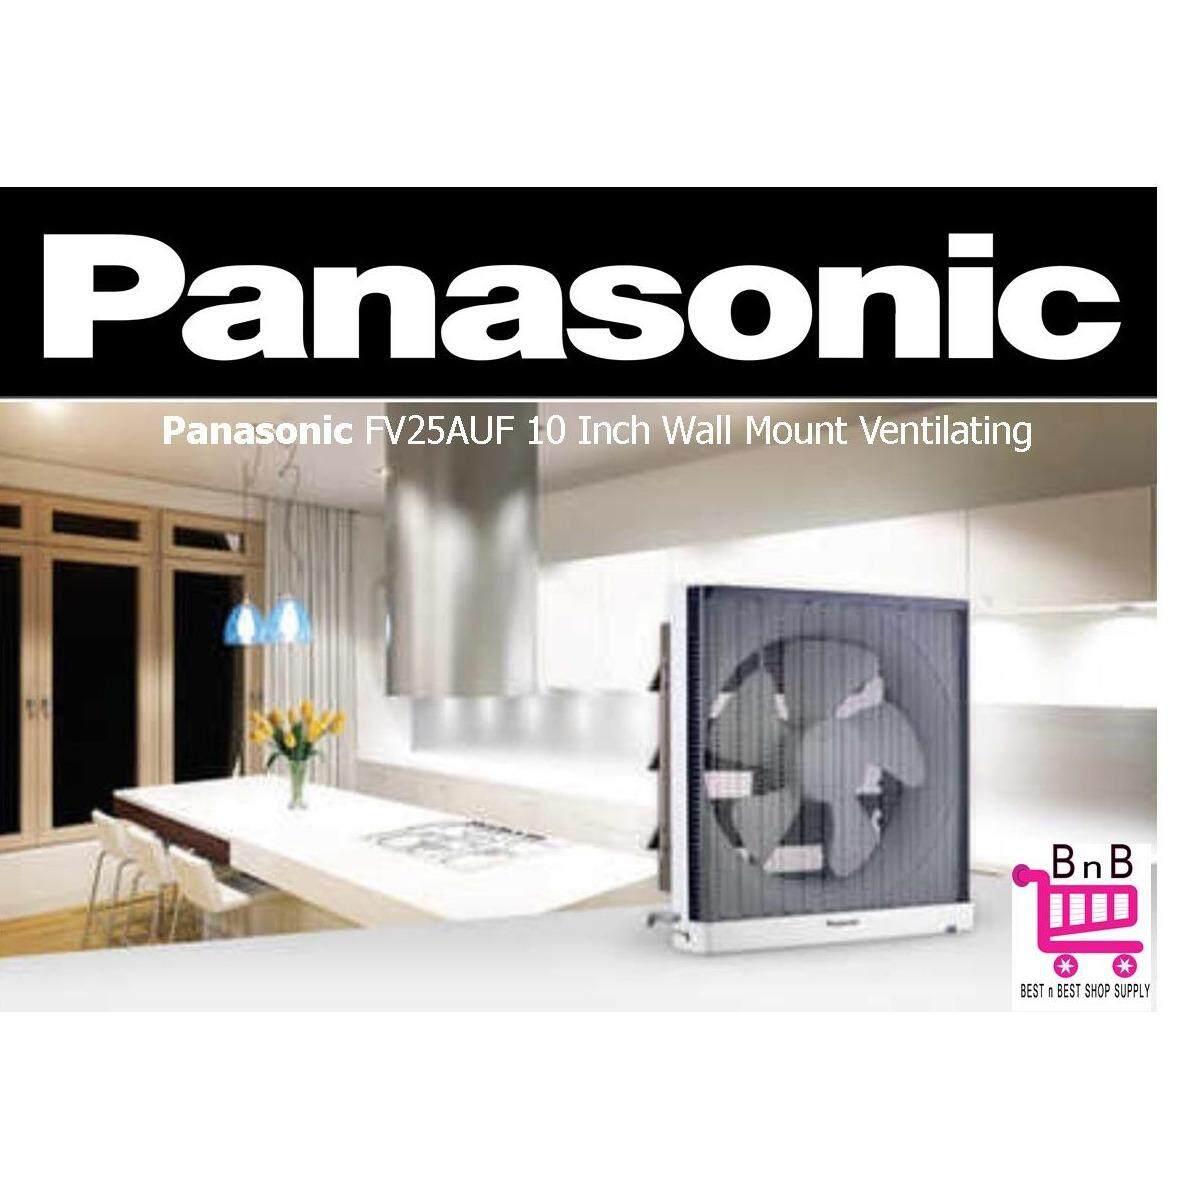 Exhaust Fan Panasonic Fv 24cdun All About Kipas Angin Plafon Ventilating Ceiling Sekai Mvf 1091 Fitur Sirocco 10 Inch